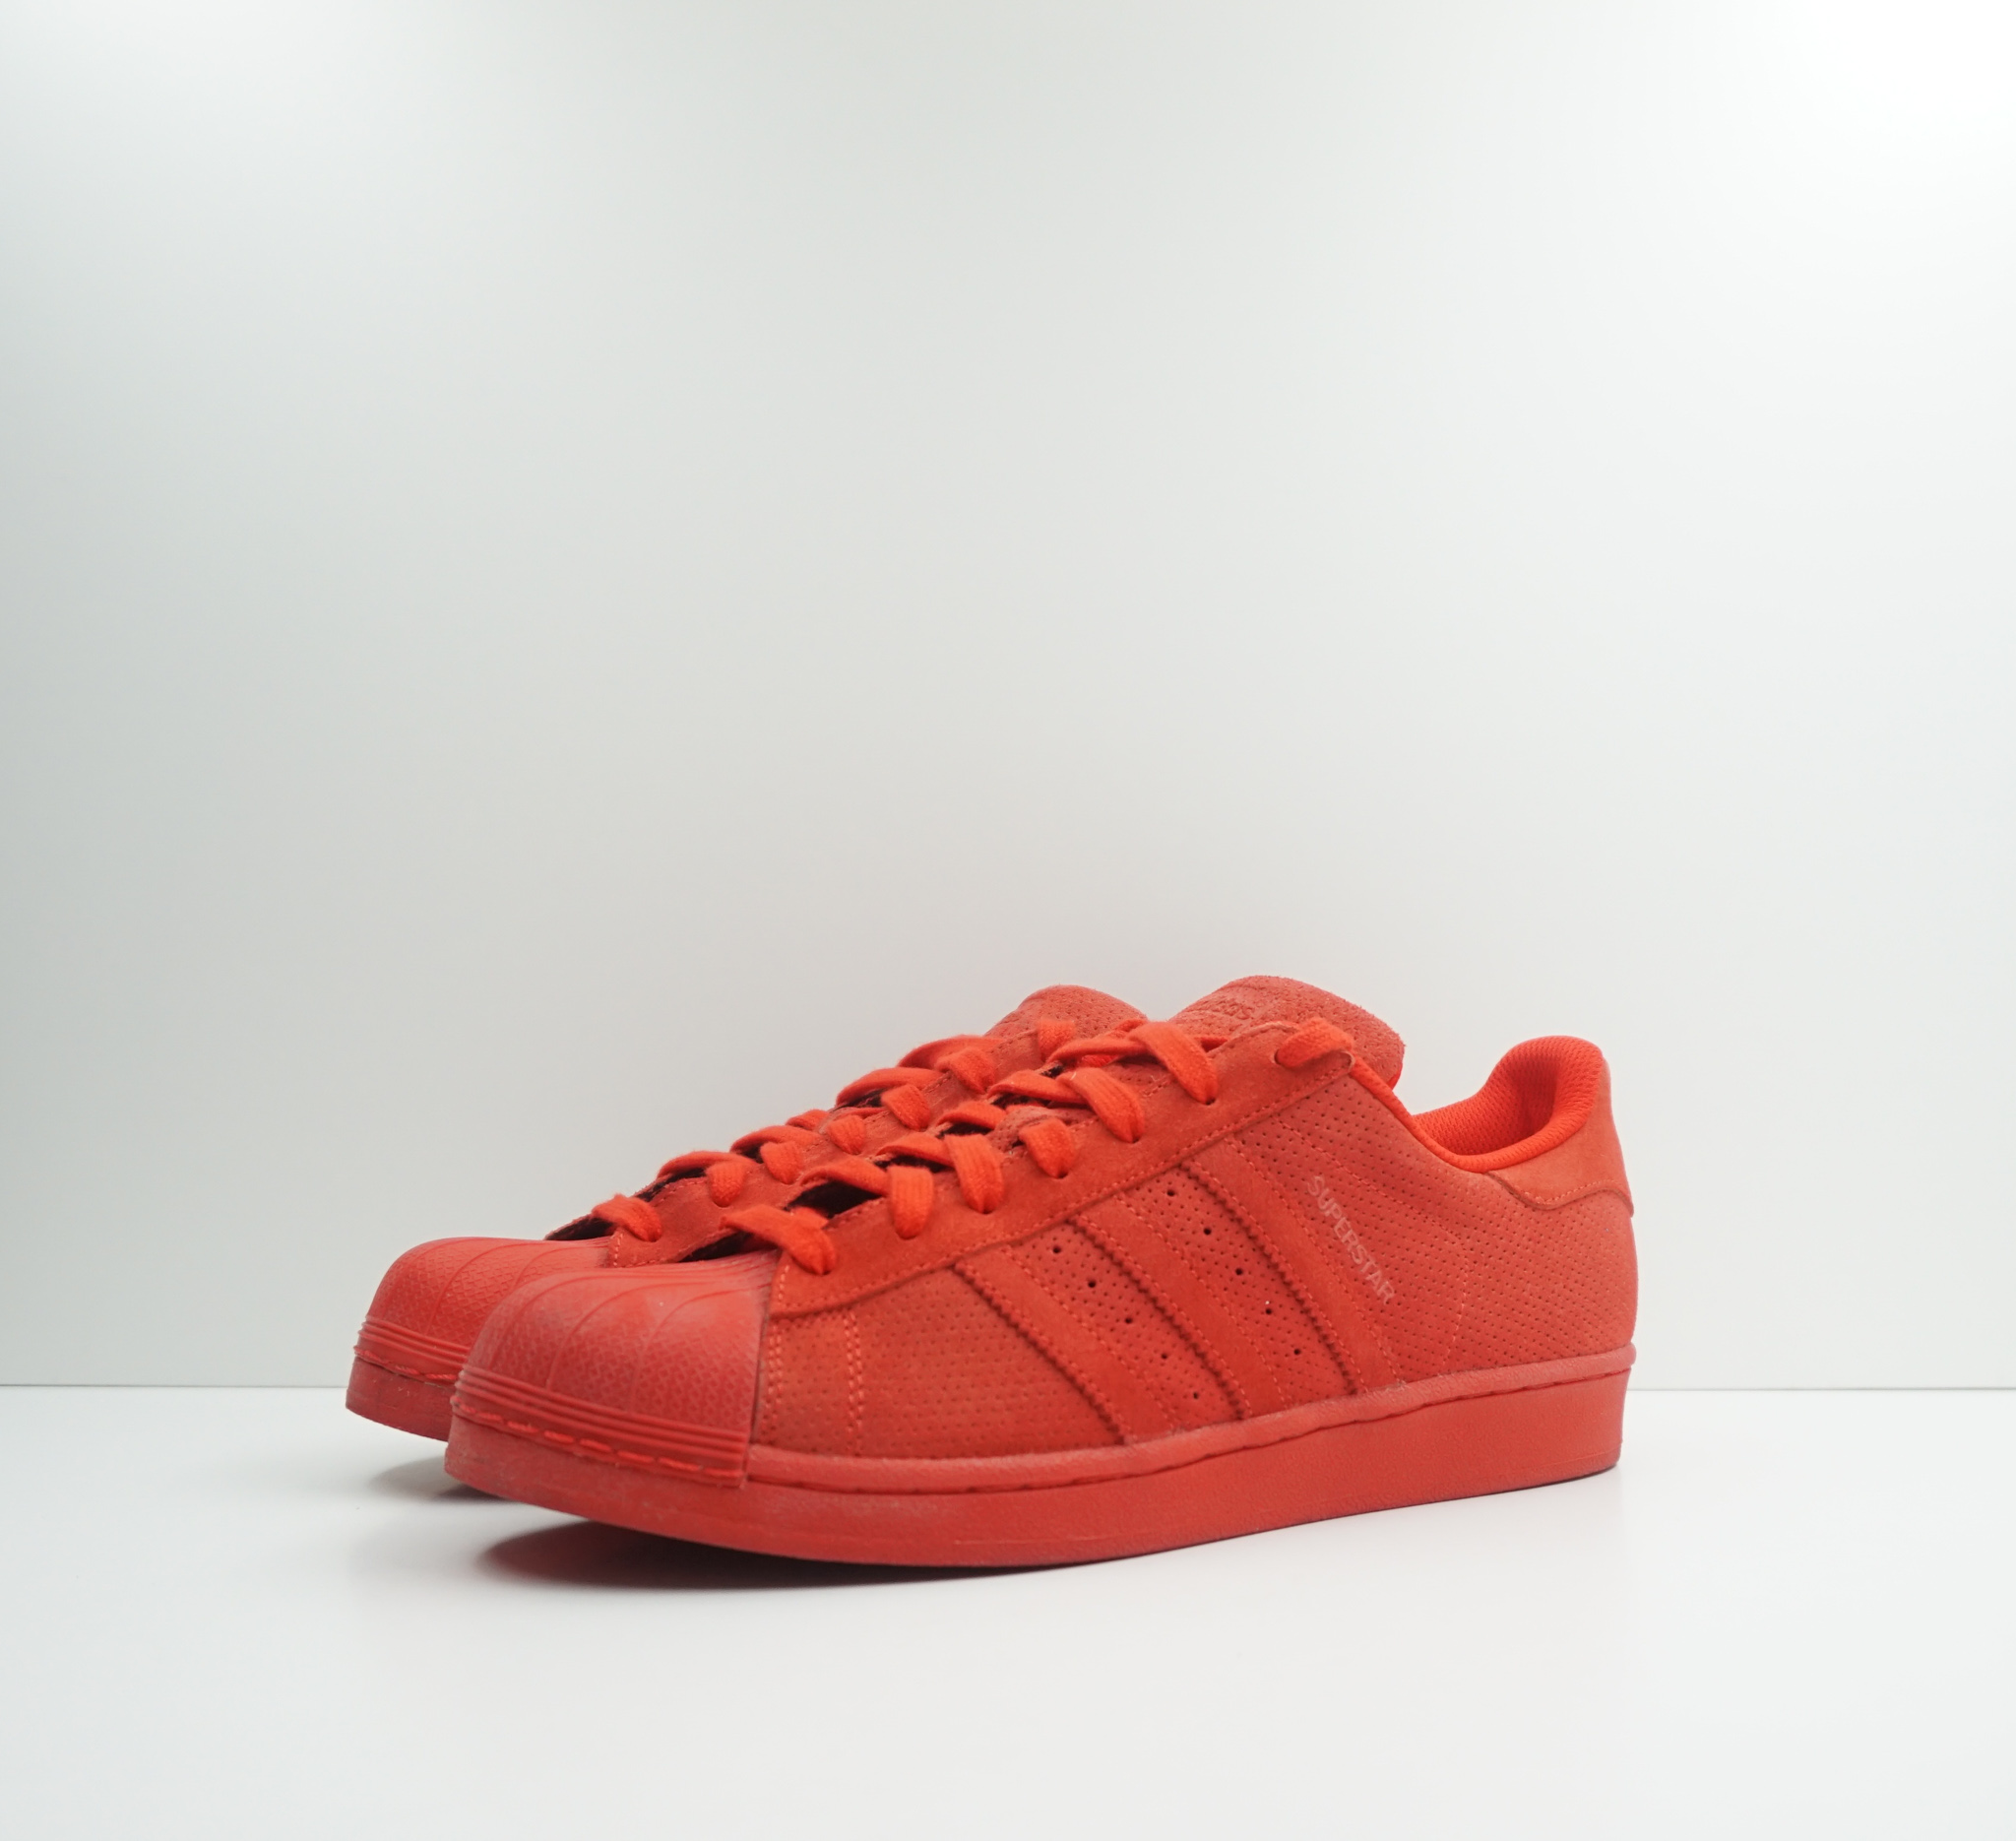 Adidas superstar RT Red